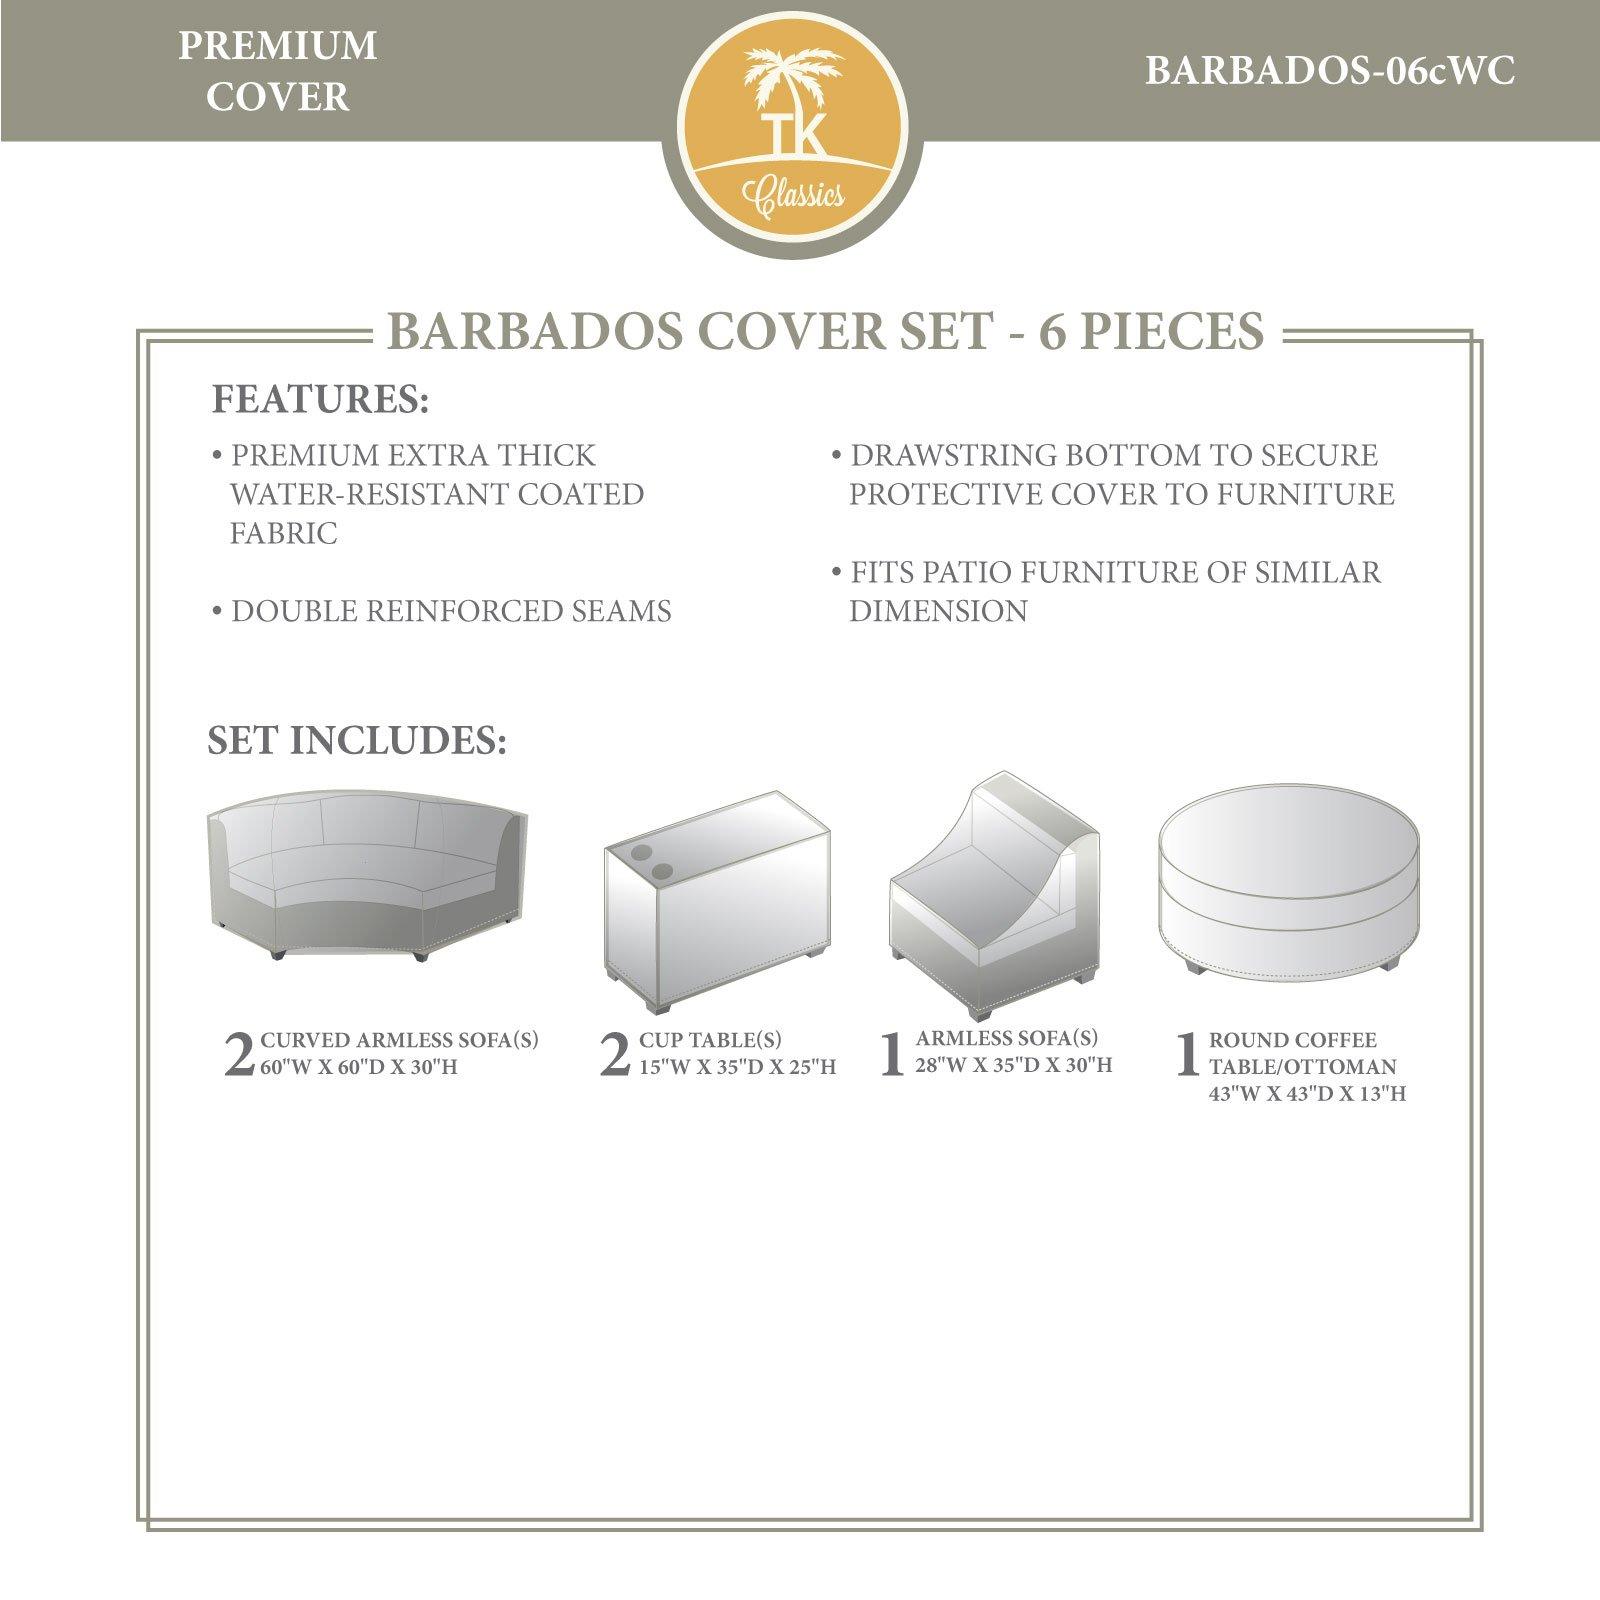 TK Classics BARBADOS-06cWC Barbados Winter Cover Set